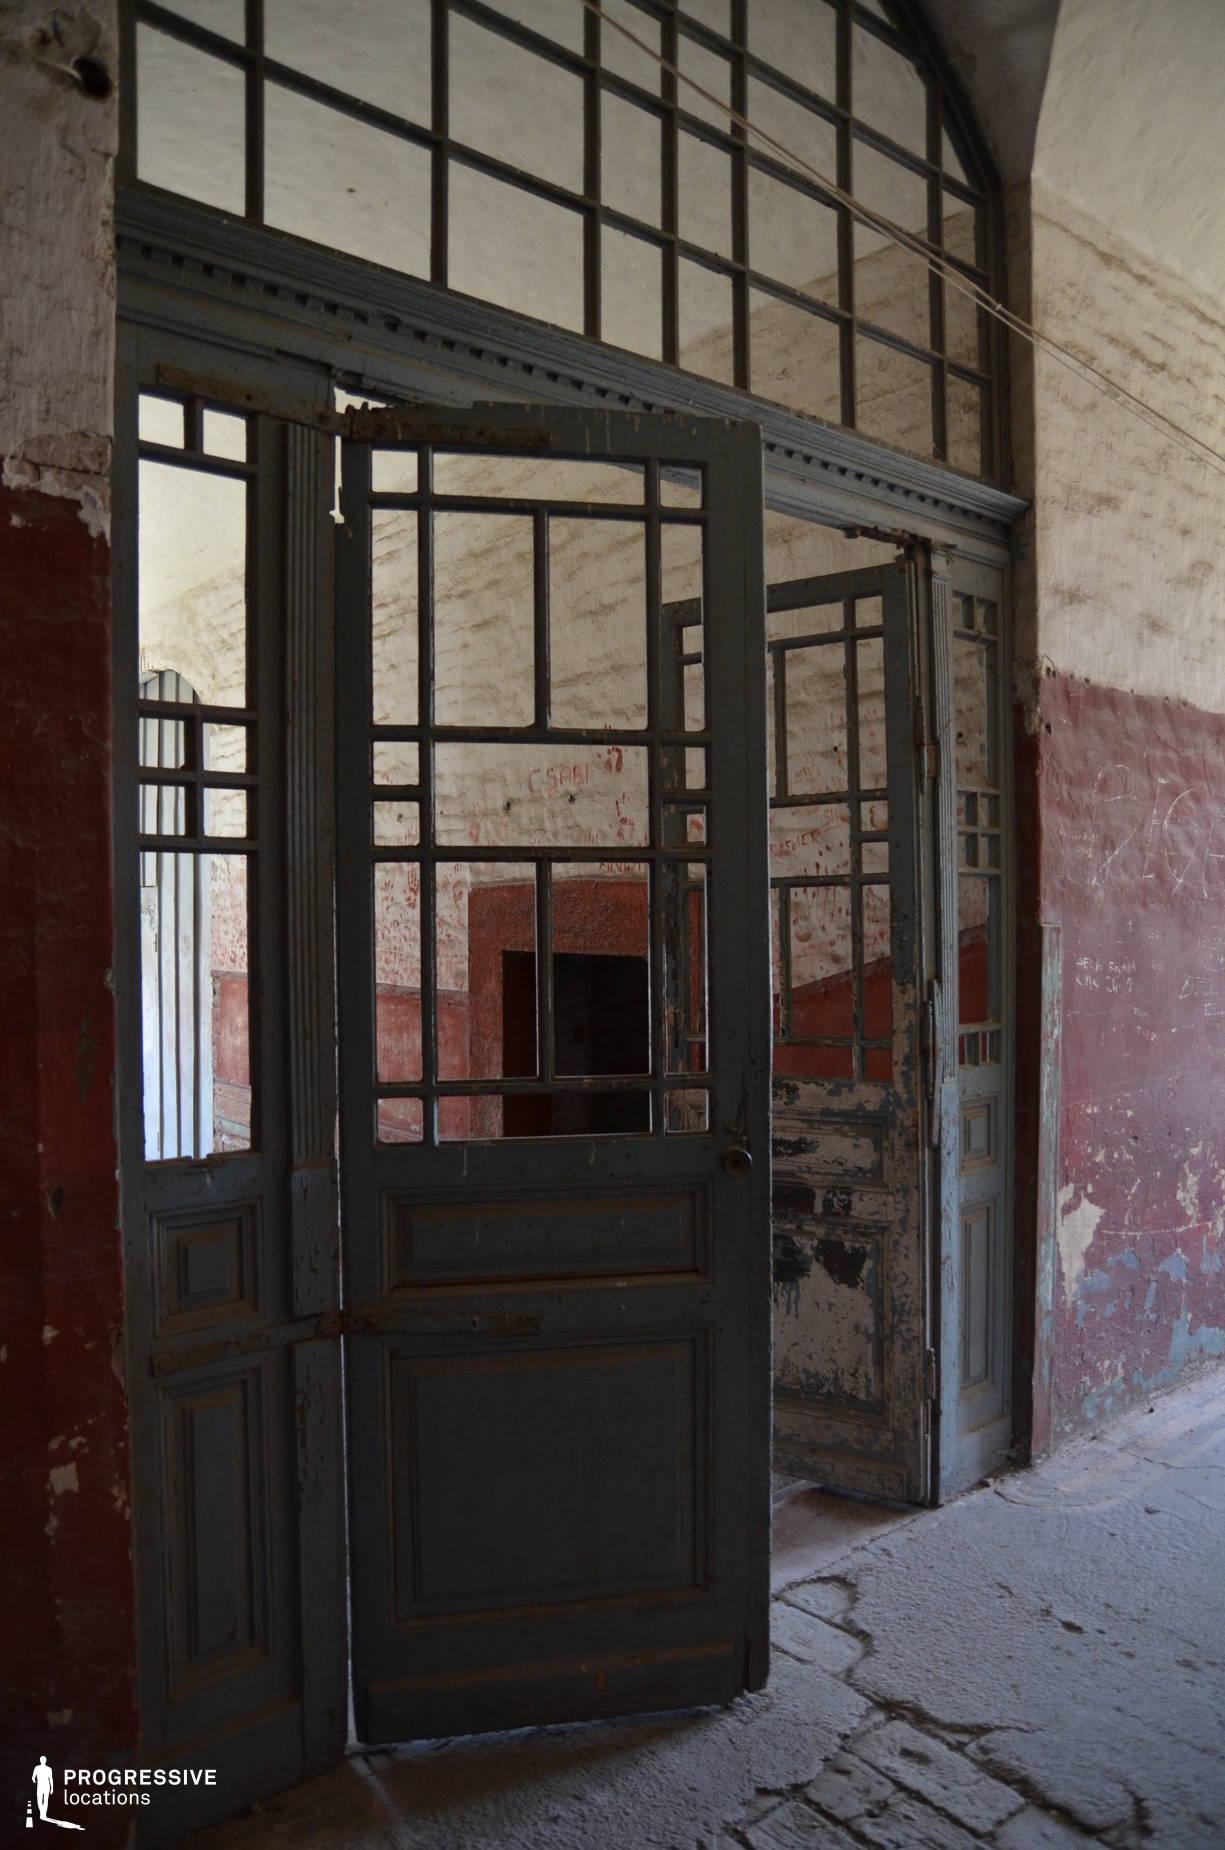 Locations in Hungary: Shabby Door, Monostor Fortress